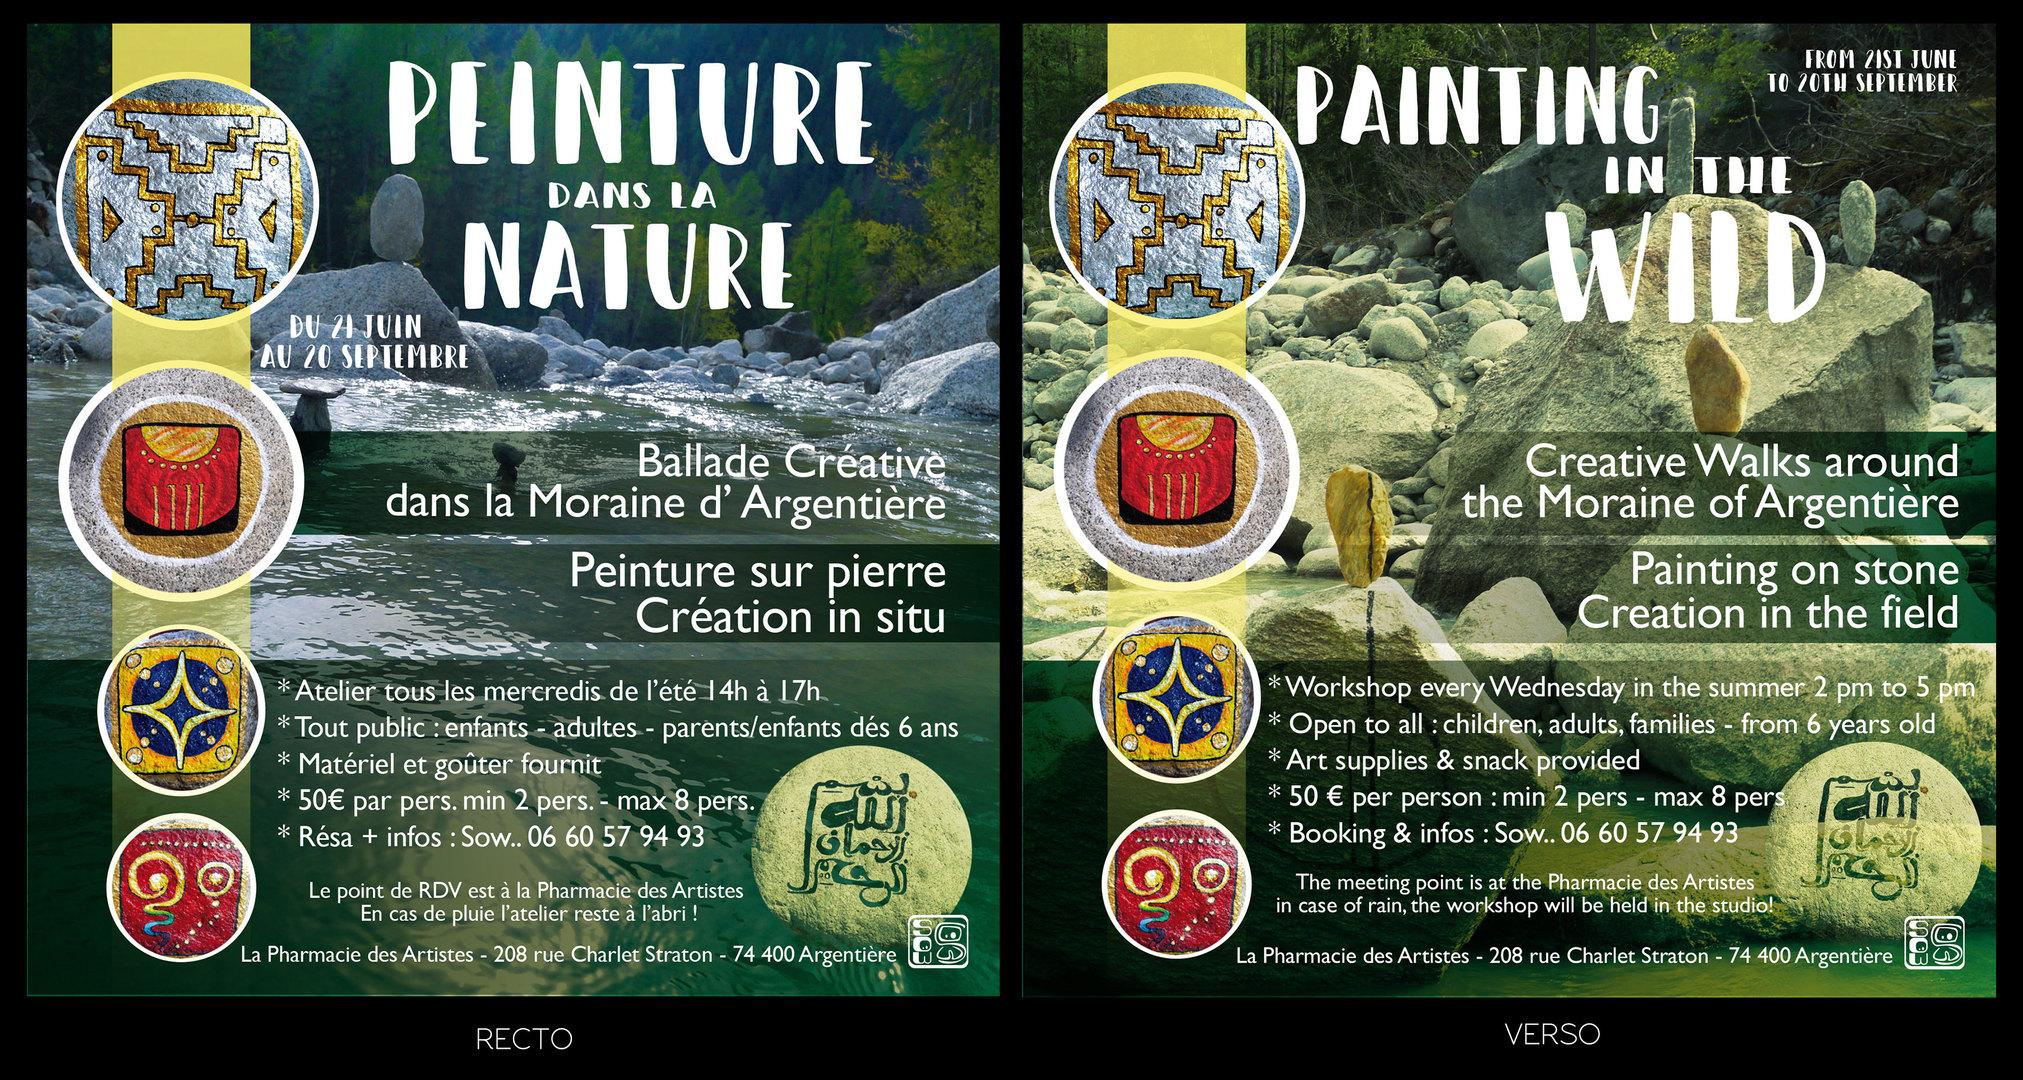 Flyer Peinture Nature